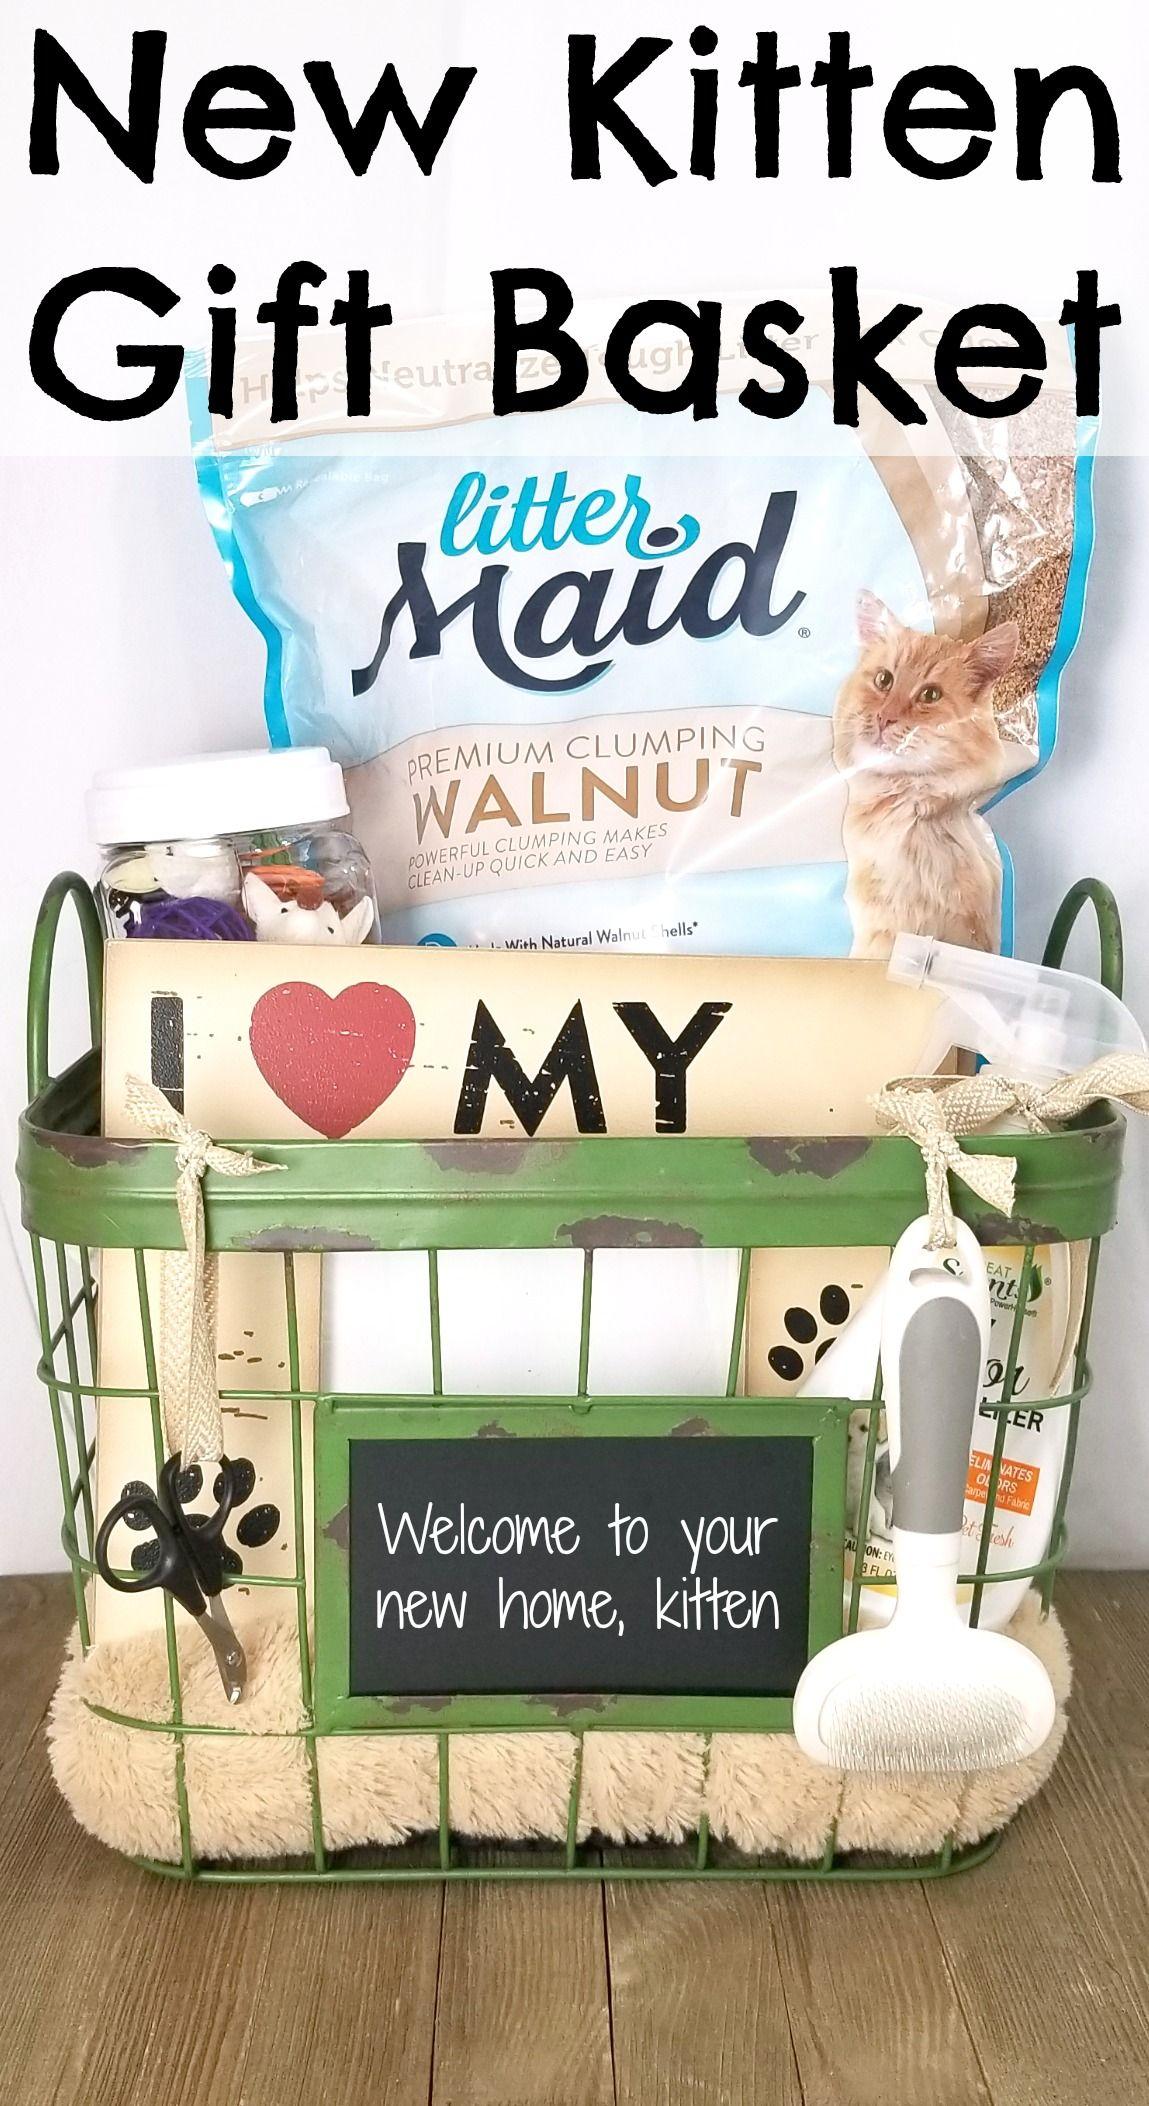 New Kitten Gift Basket Pet Gift Basket Kittens Gifts Dog Gift Basket